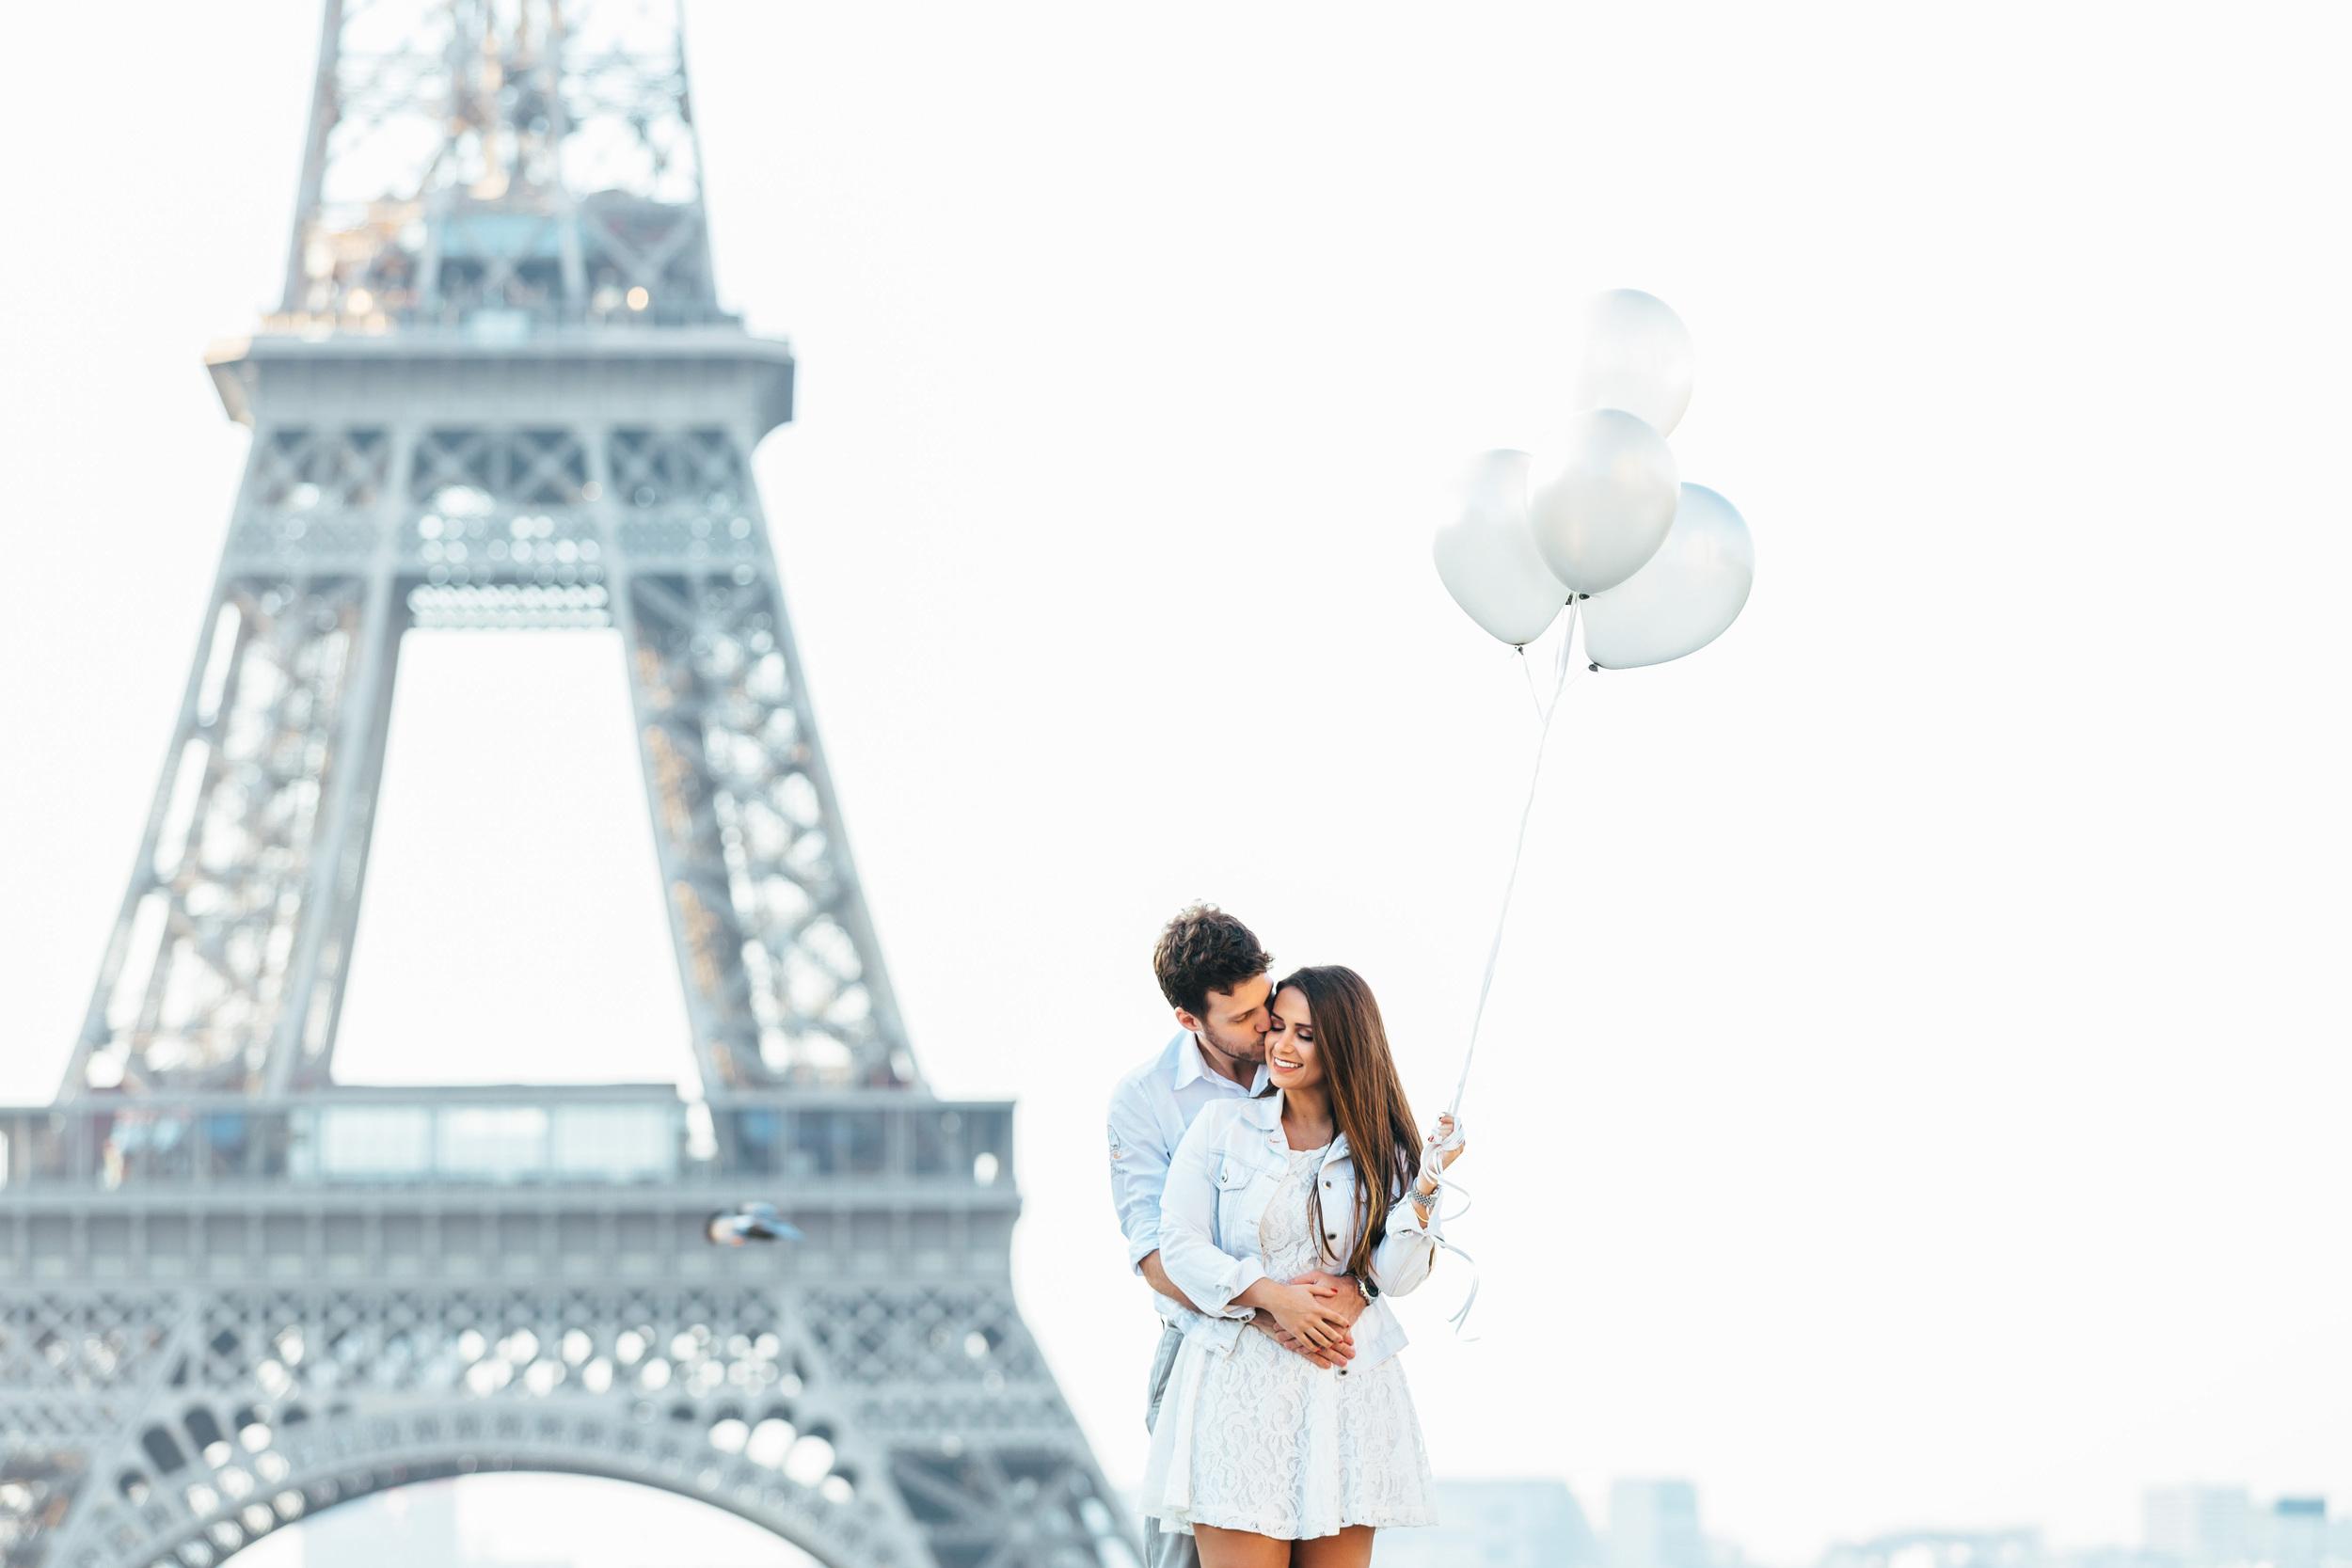 Paris Photographer, Eiffel Tower, Lovestory, Trocadero, Iheartparisfr